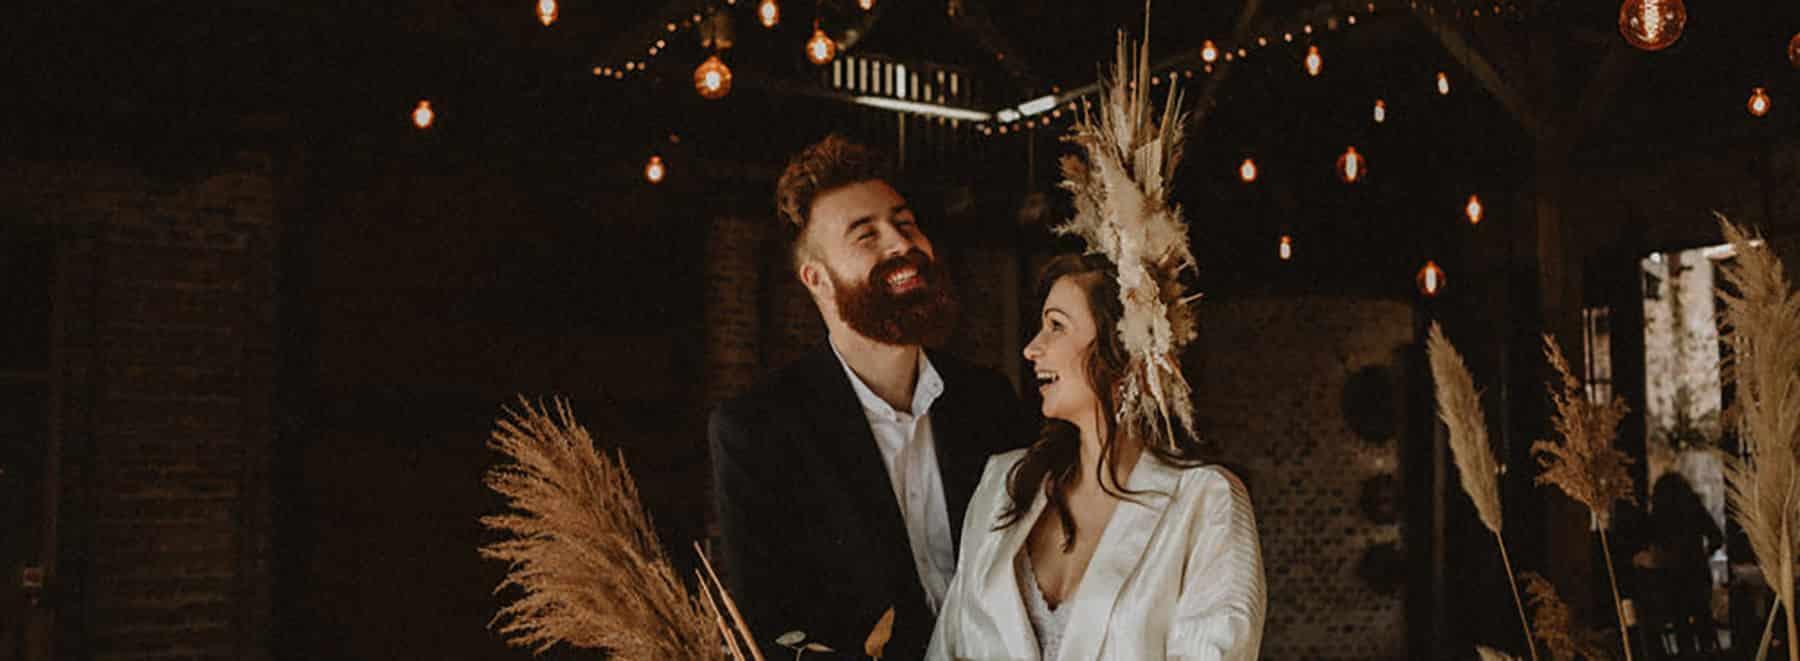 ceremonie mariage la rochelle